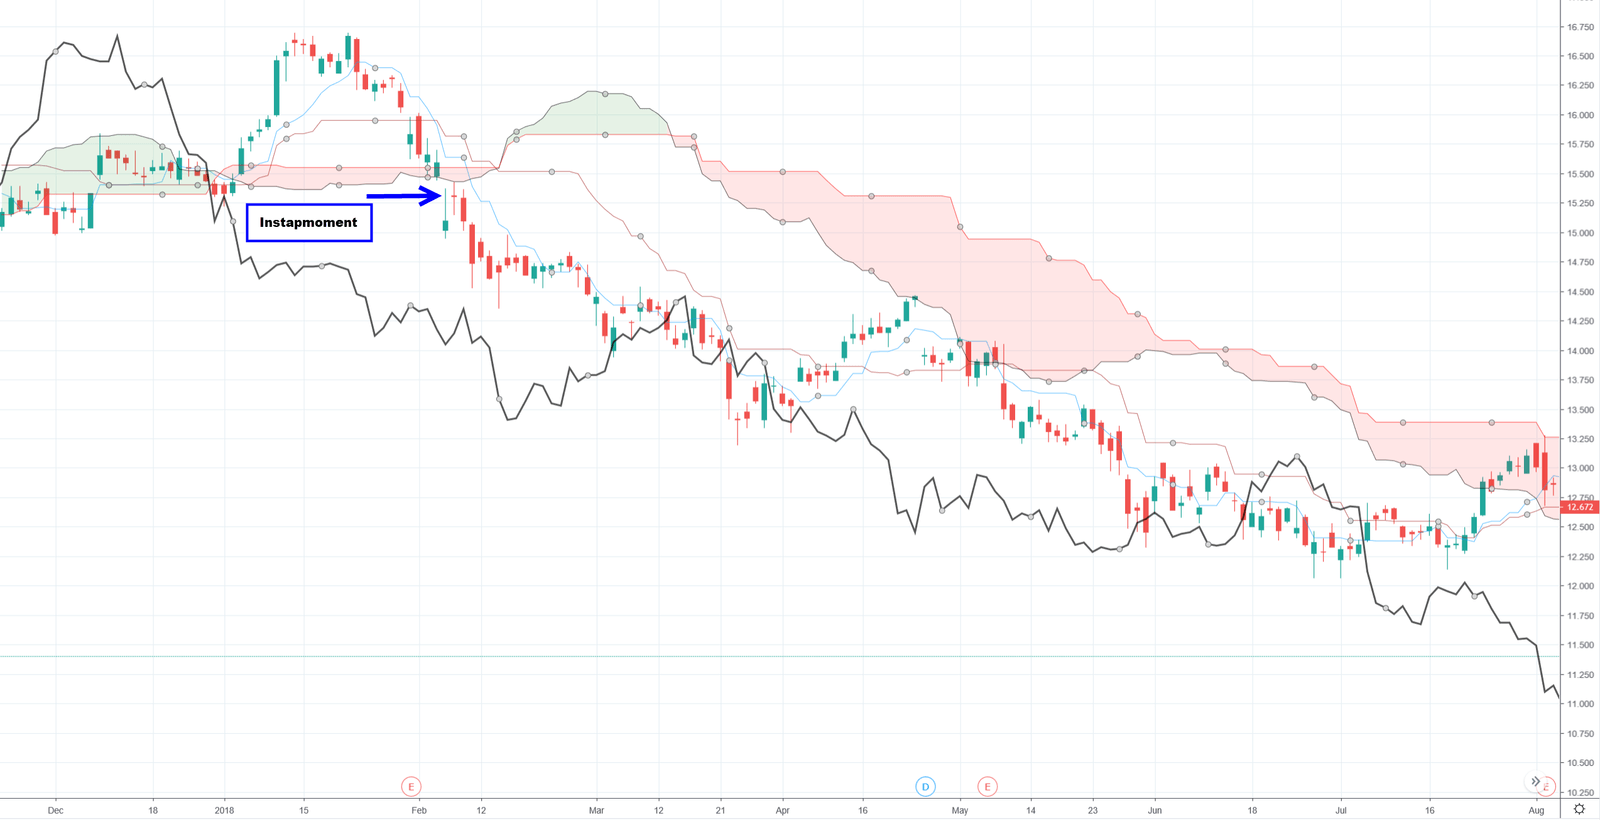 Resultaat handelsstrategie short Ichimoku - Ichimoku indicator